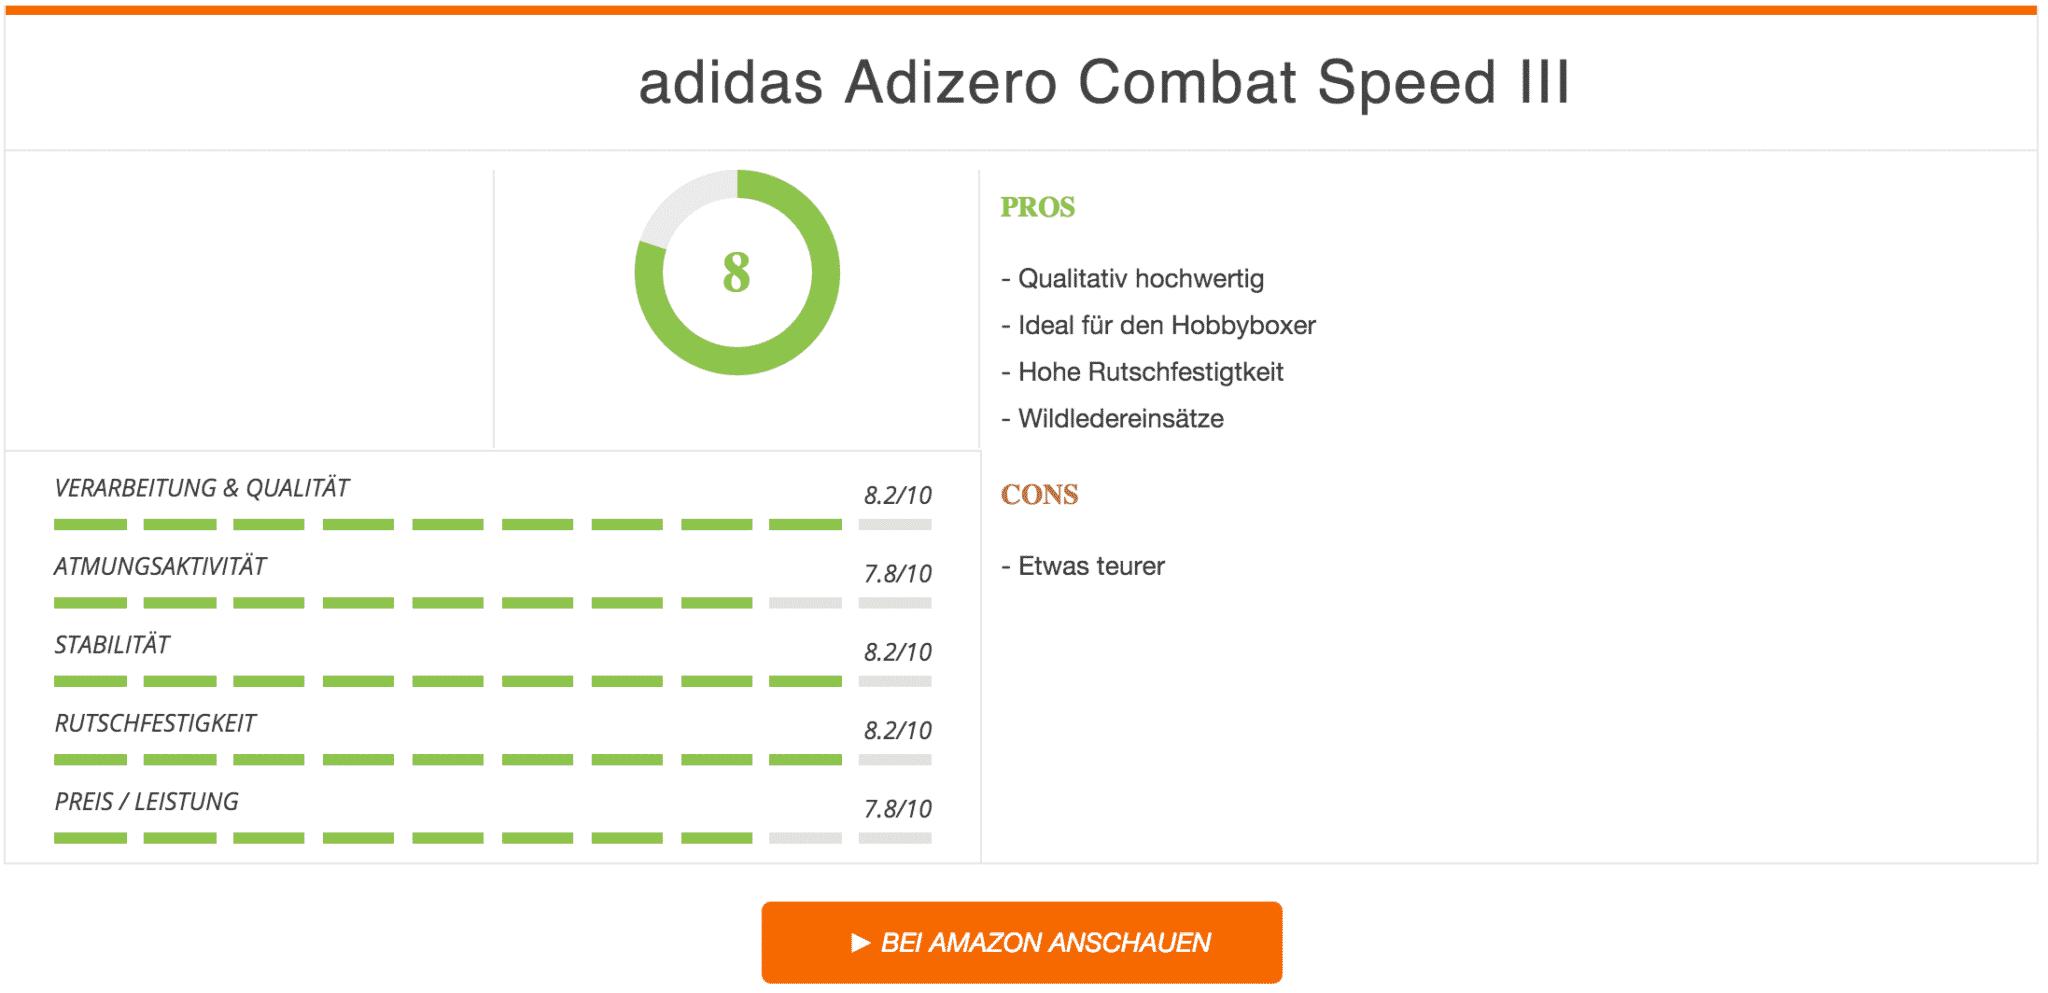 Boxstiefel Test Bewertung Adidas-Adizero Combat Speed III Boxerstiefel